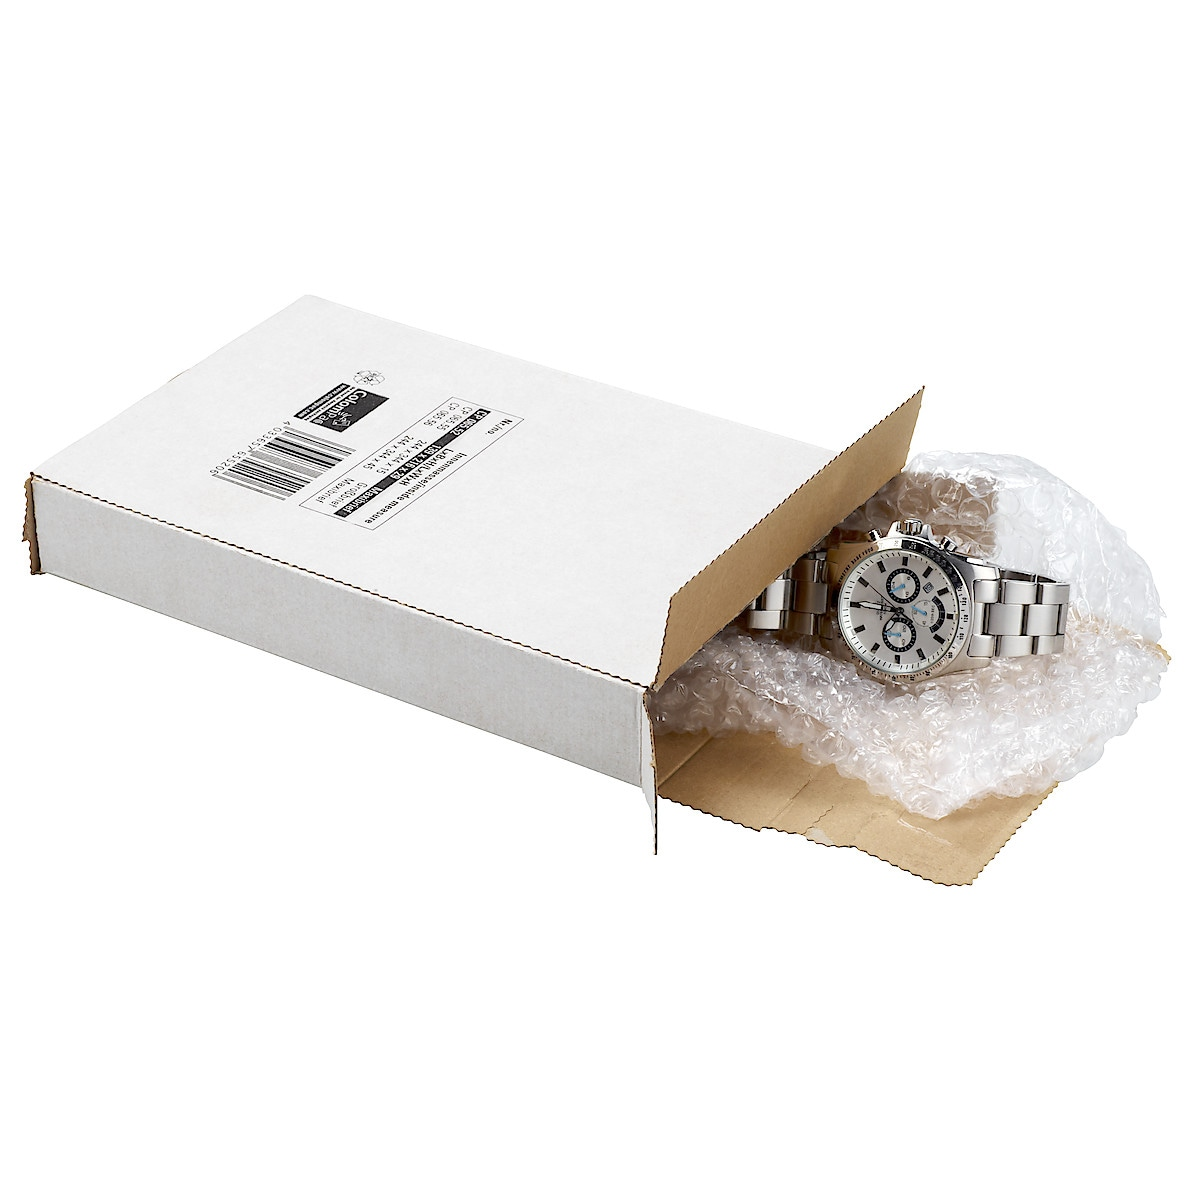 Postituspaketti